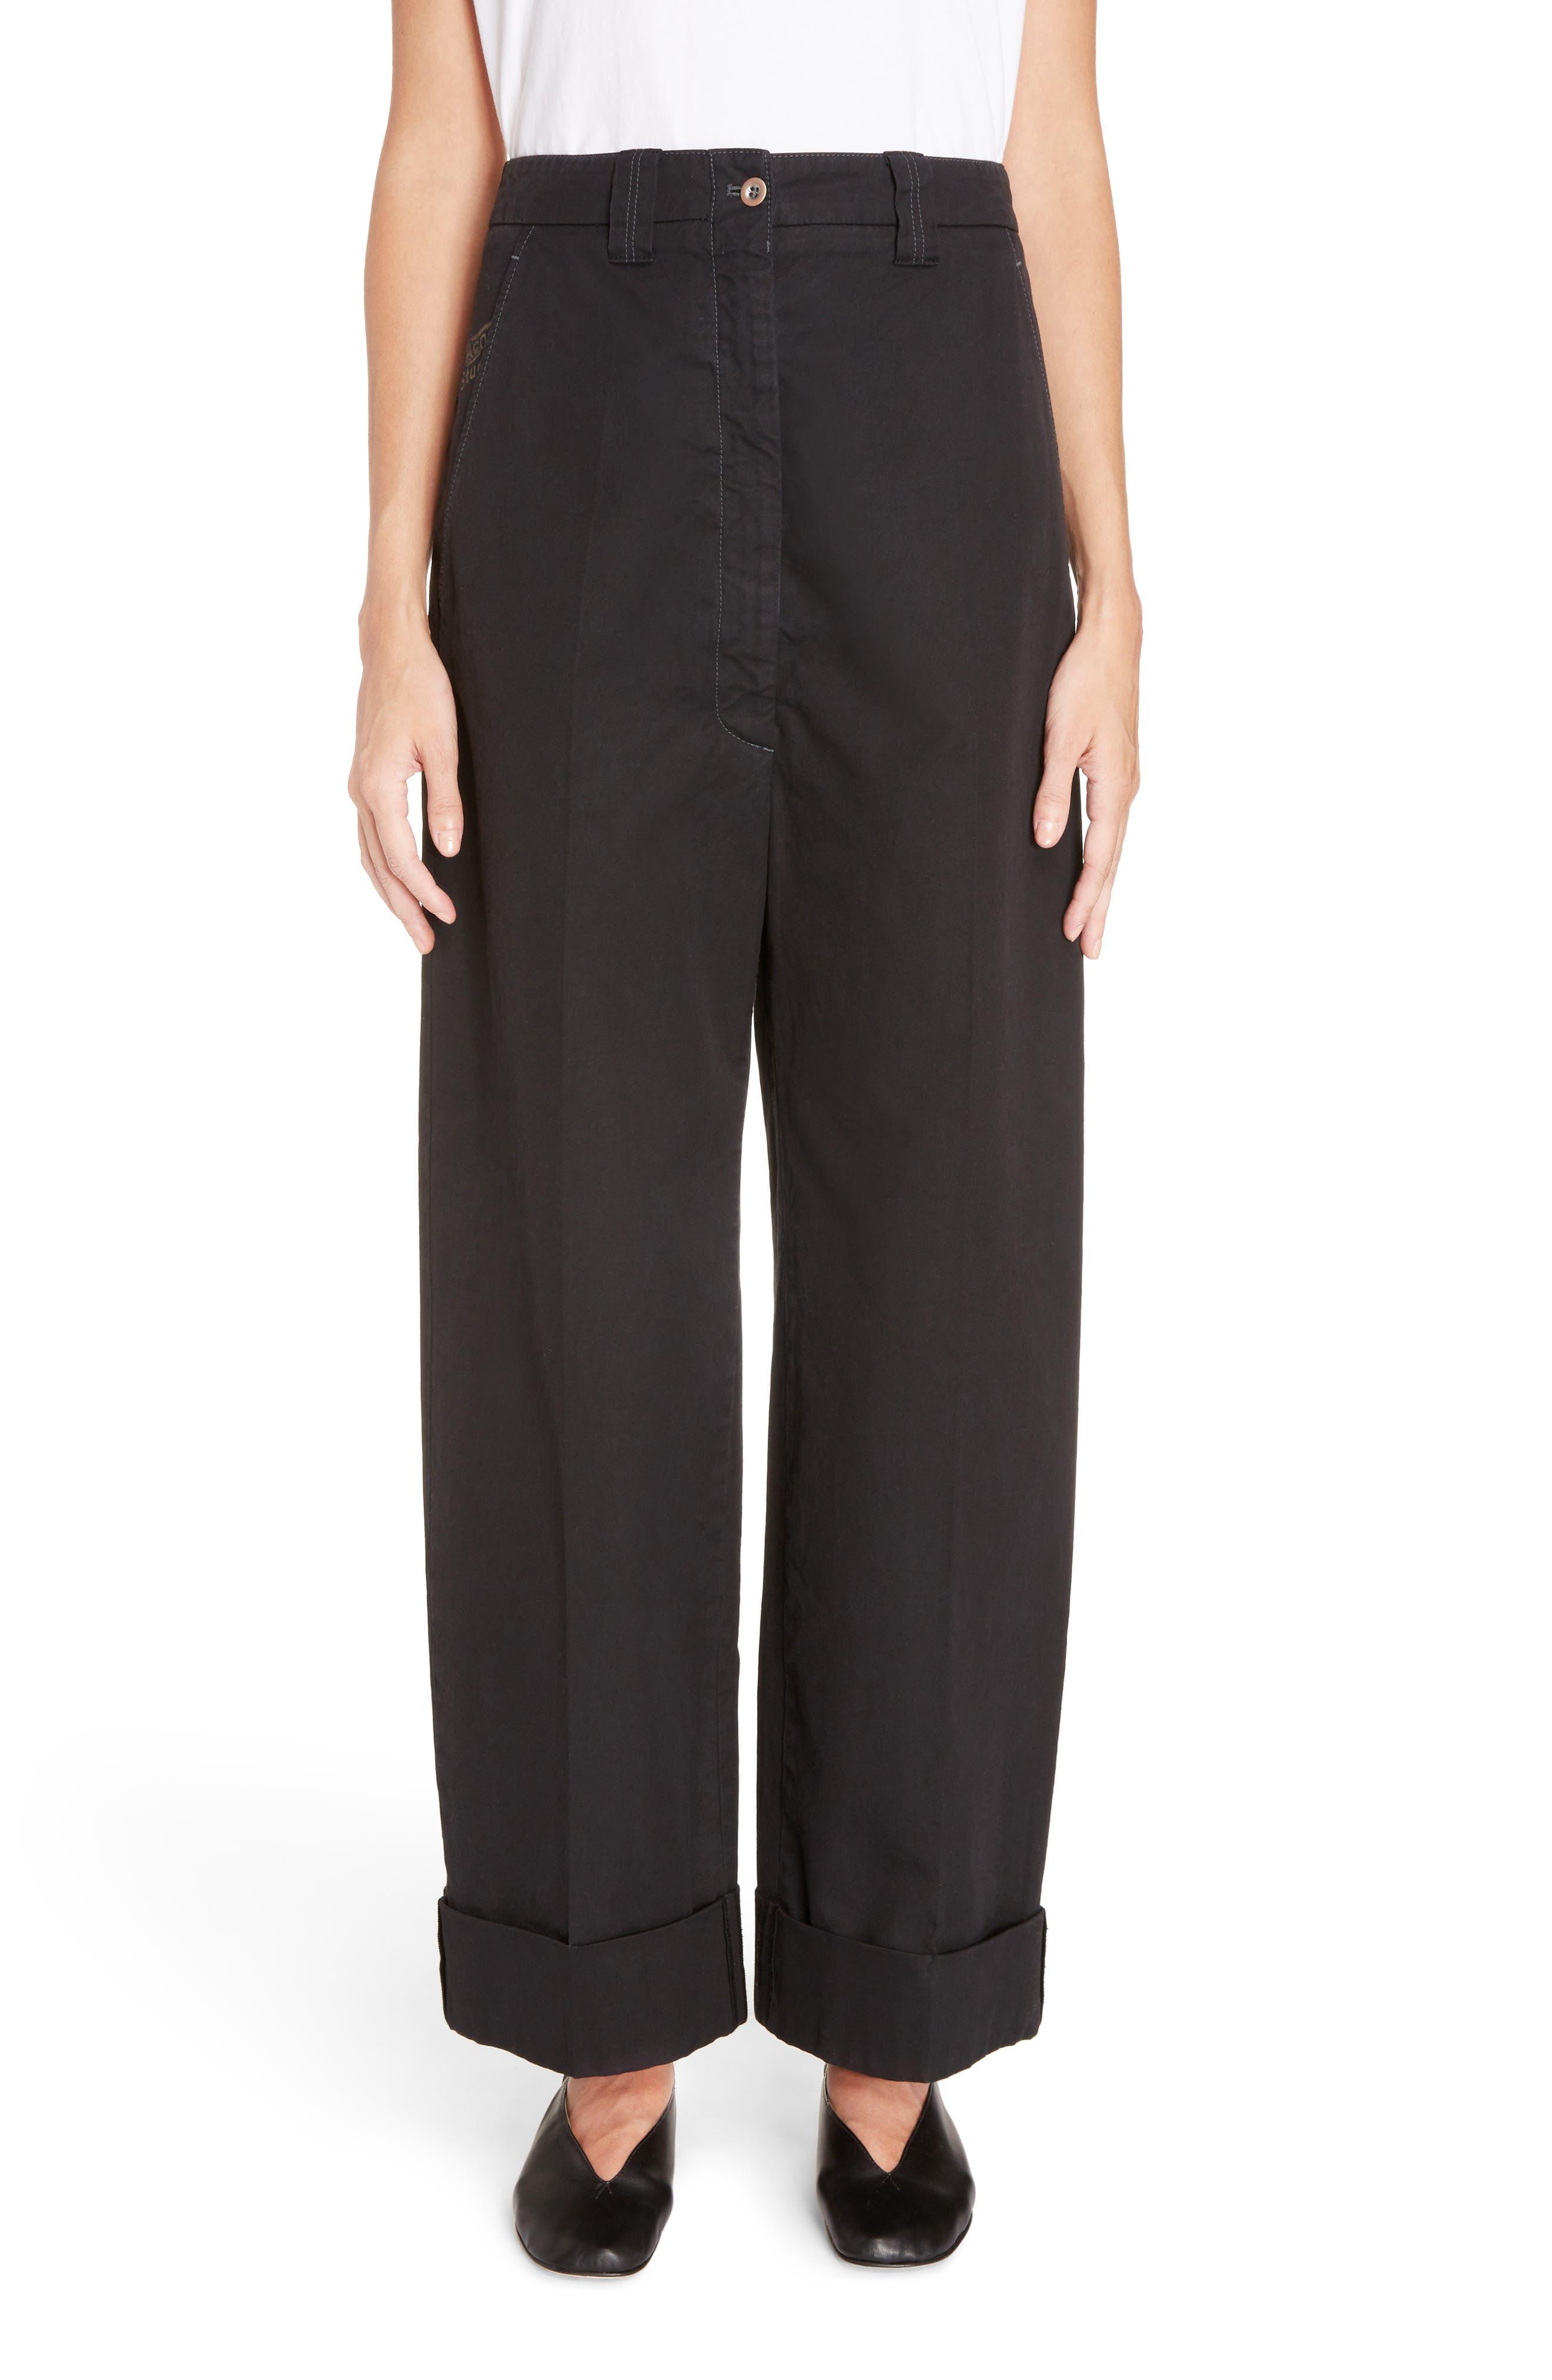 Madya Cuffed Cotton Pants,                         Main,                         color, 001